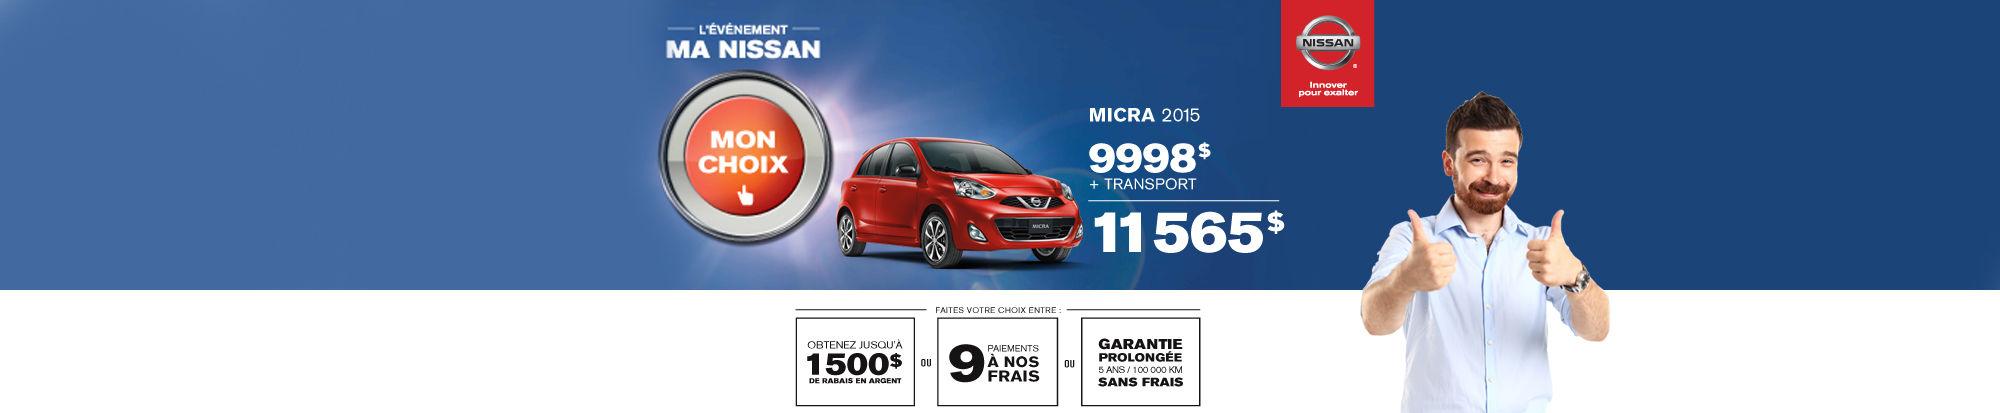 Nissan Micra juin